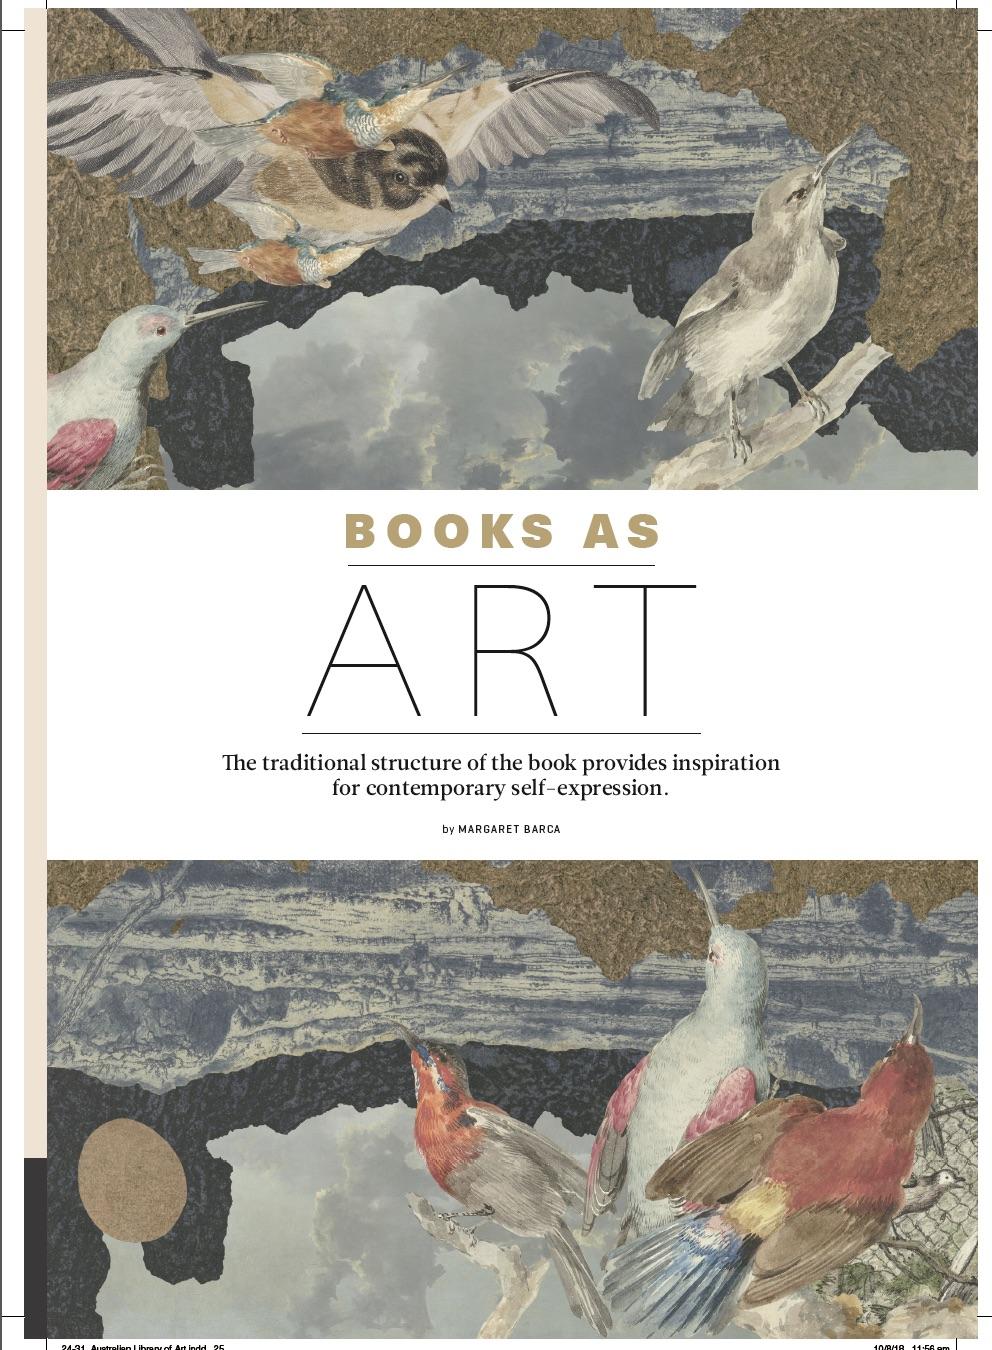 Books asArt -ARtLife magazine margaretbarca